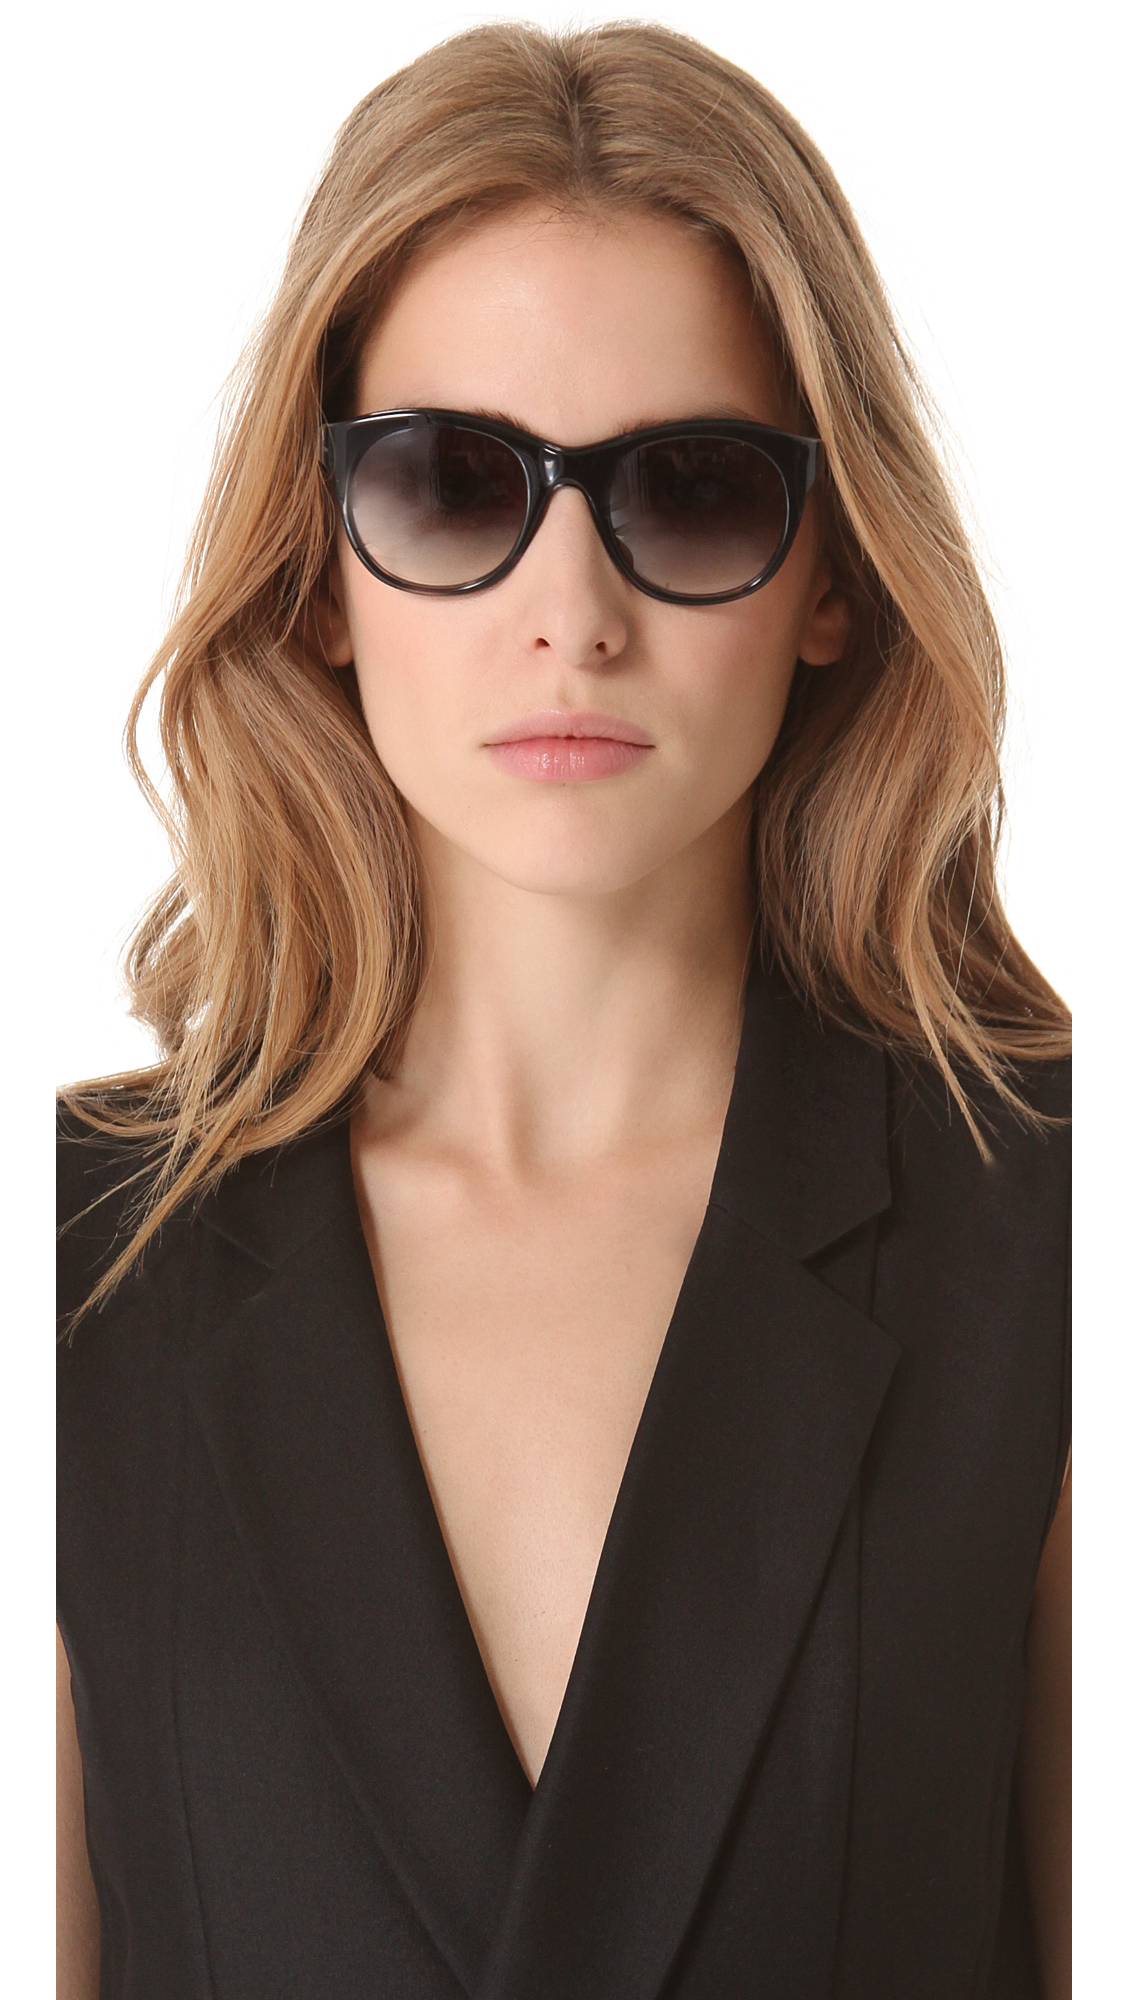 lyst elizabeth and james horatio sunglasses in gray. Black Bedroom Furniture Sets. Home Design Ideas